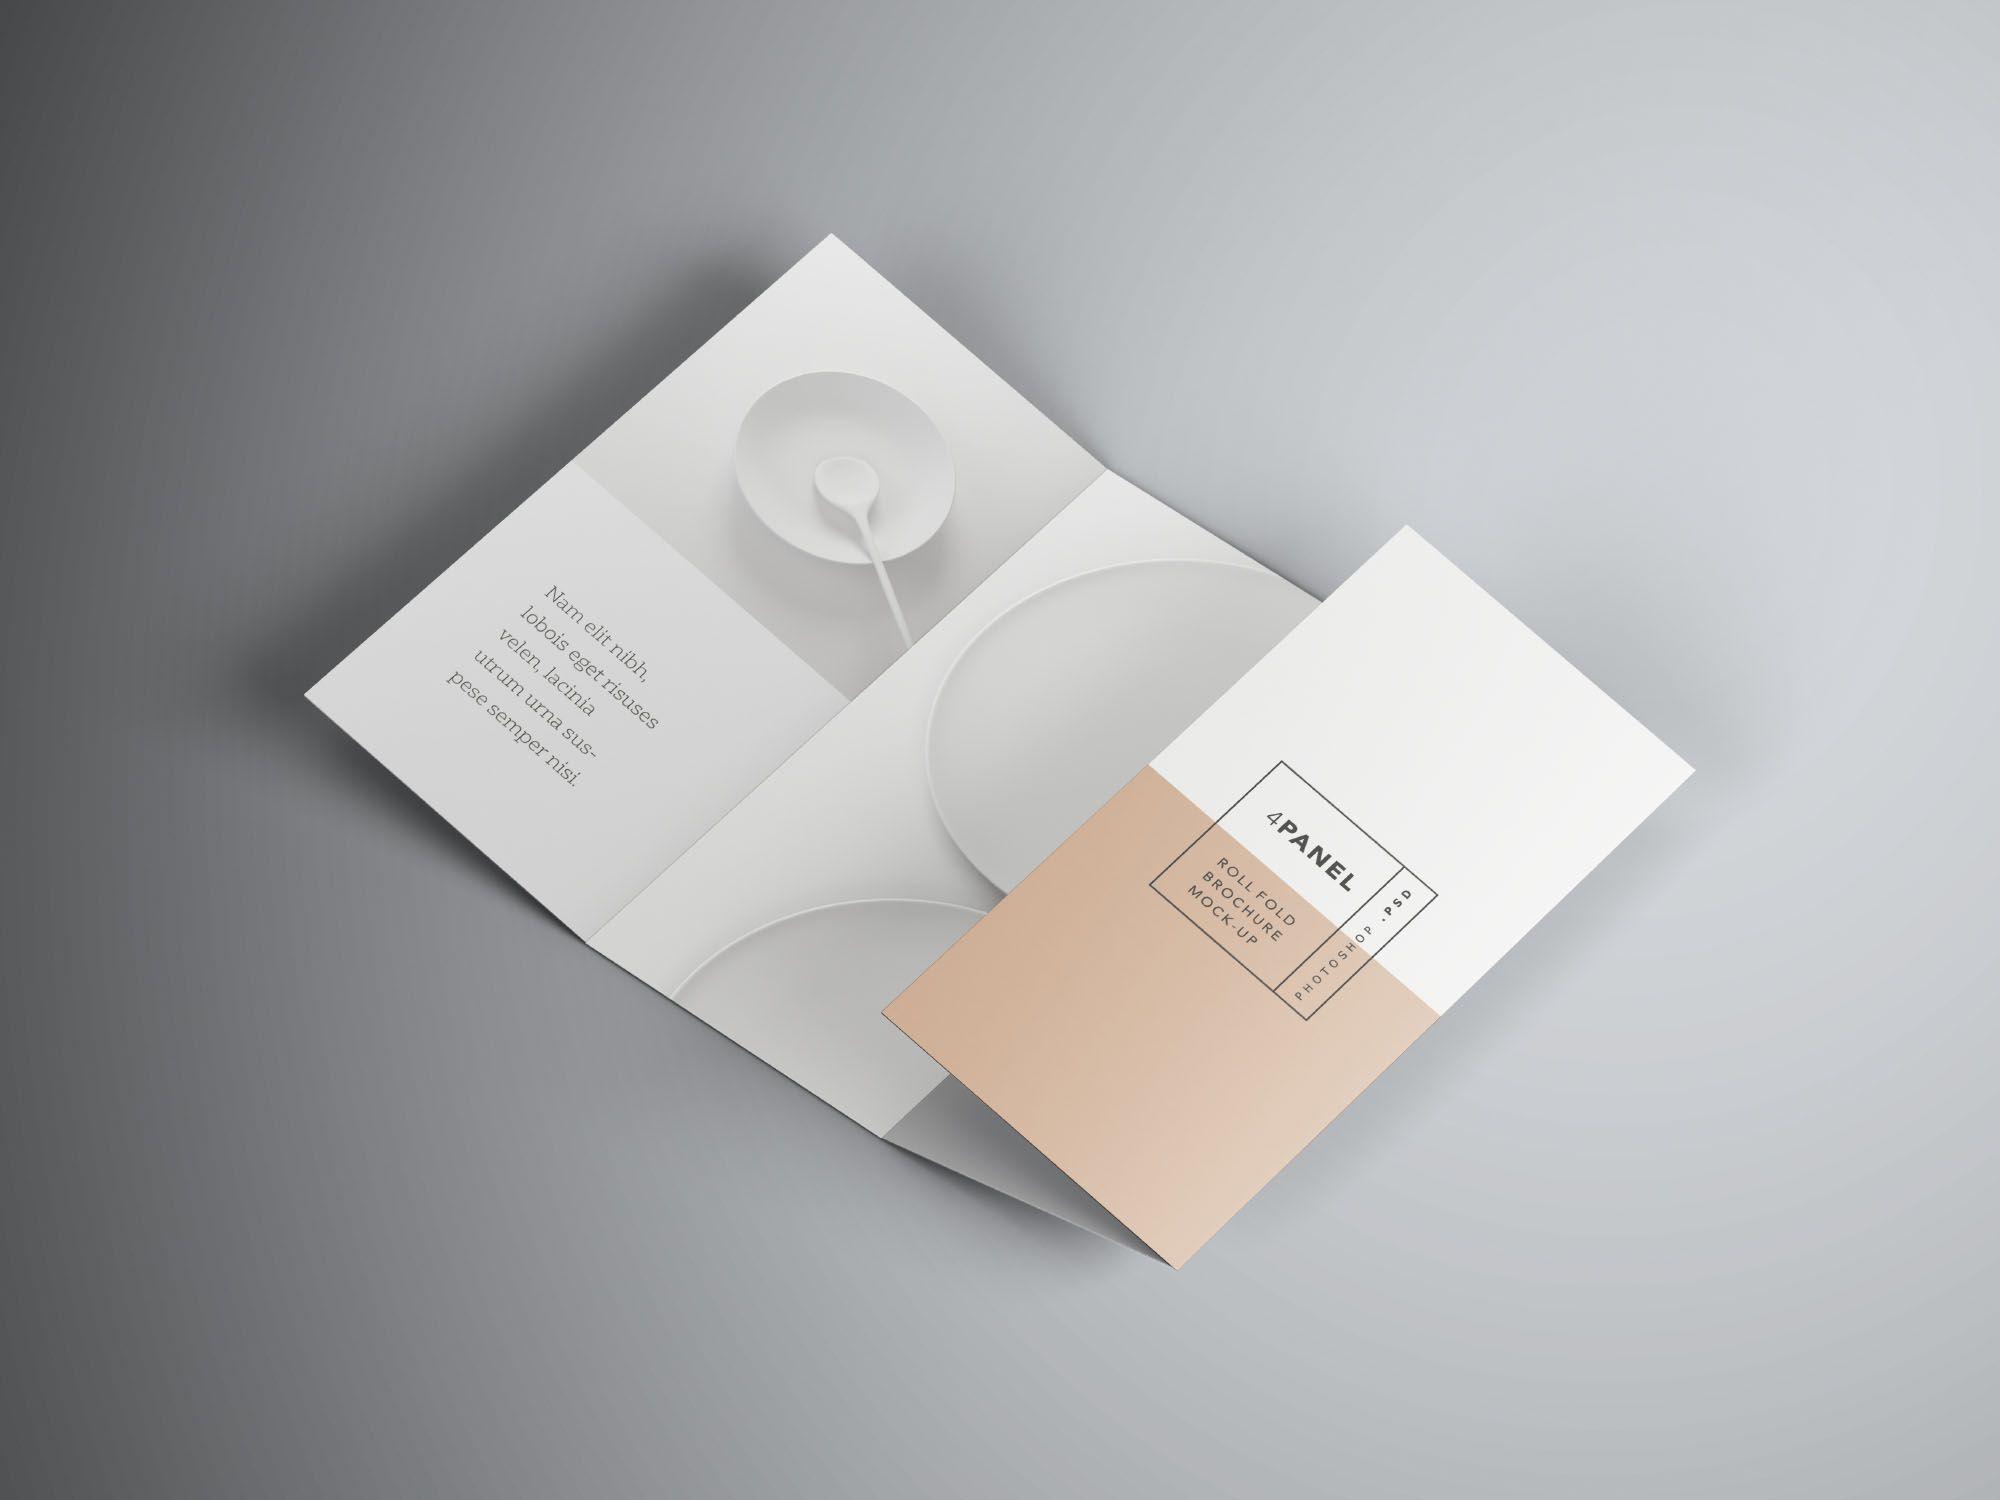 4 Panel Roll Fold Brochure Mockup Folletos, Panel